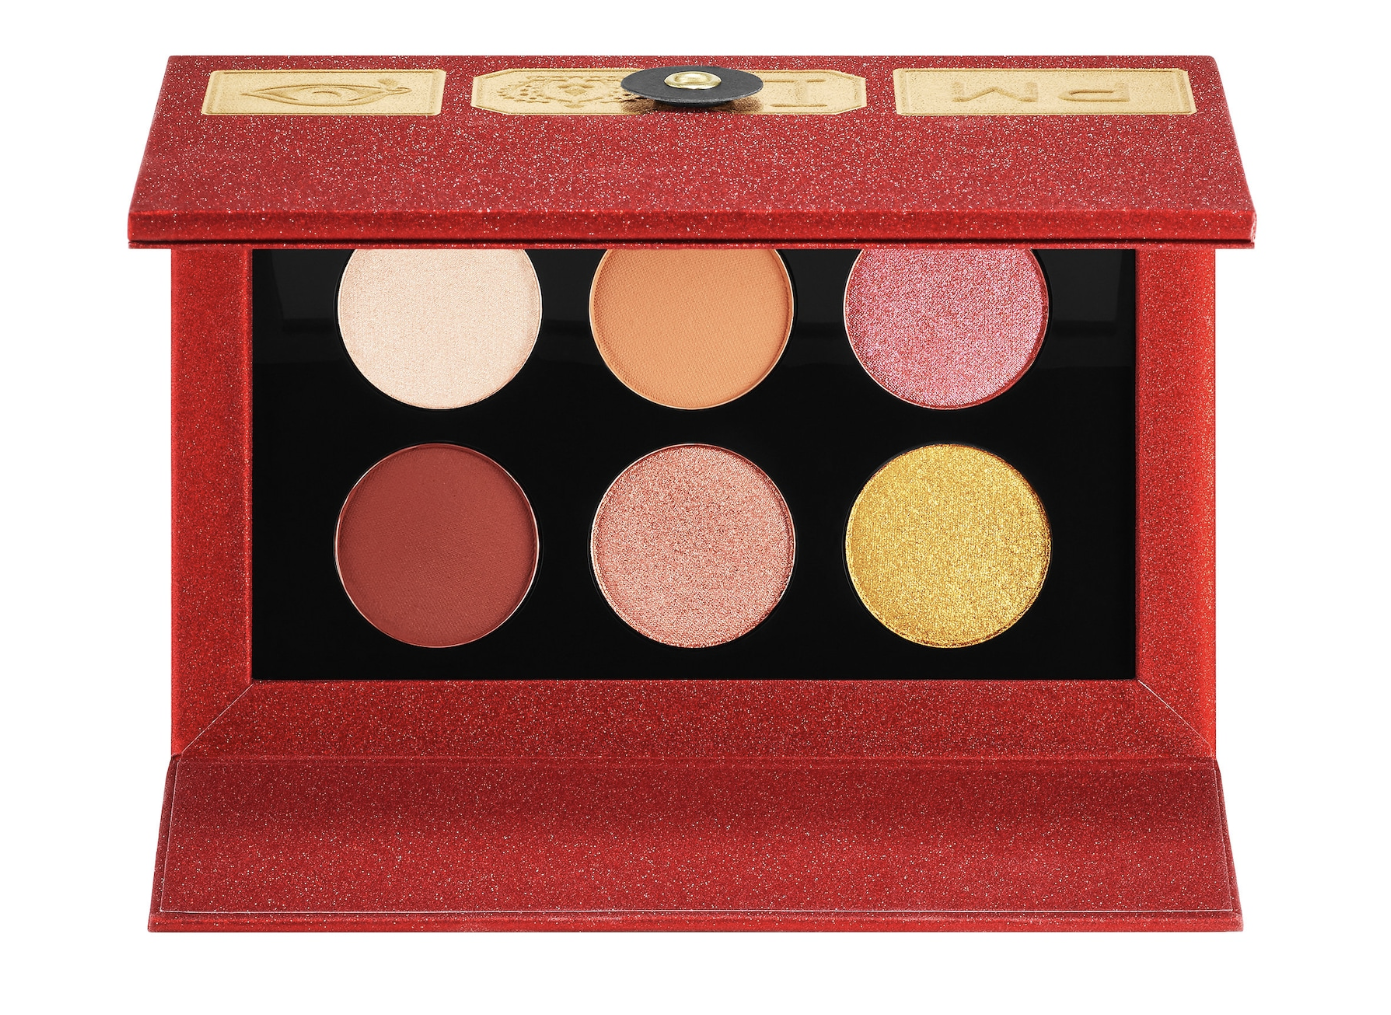 Pat McGrath Labs MTHRSHP Sublime: Golden Opulence Eyeshadow Palette